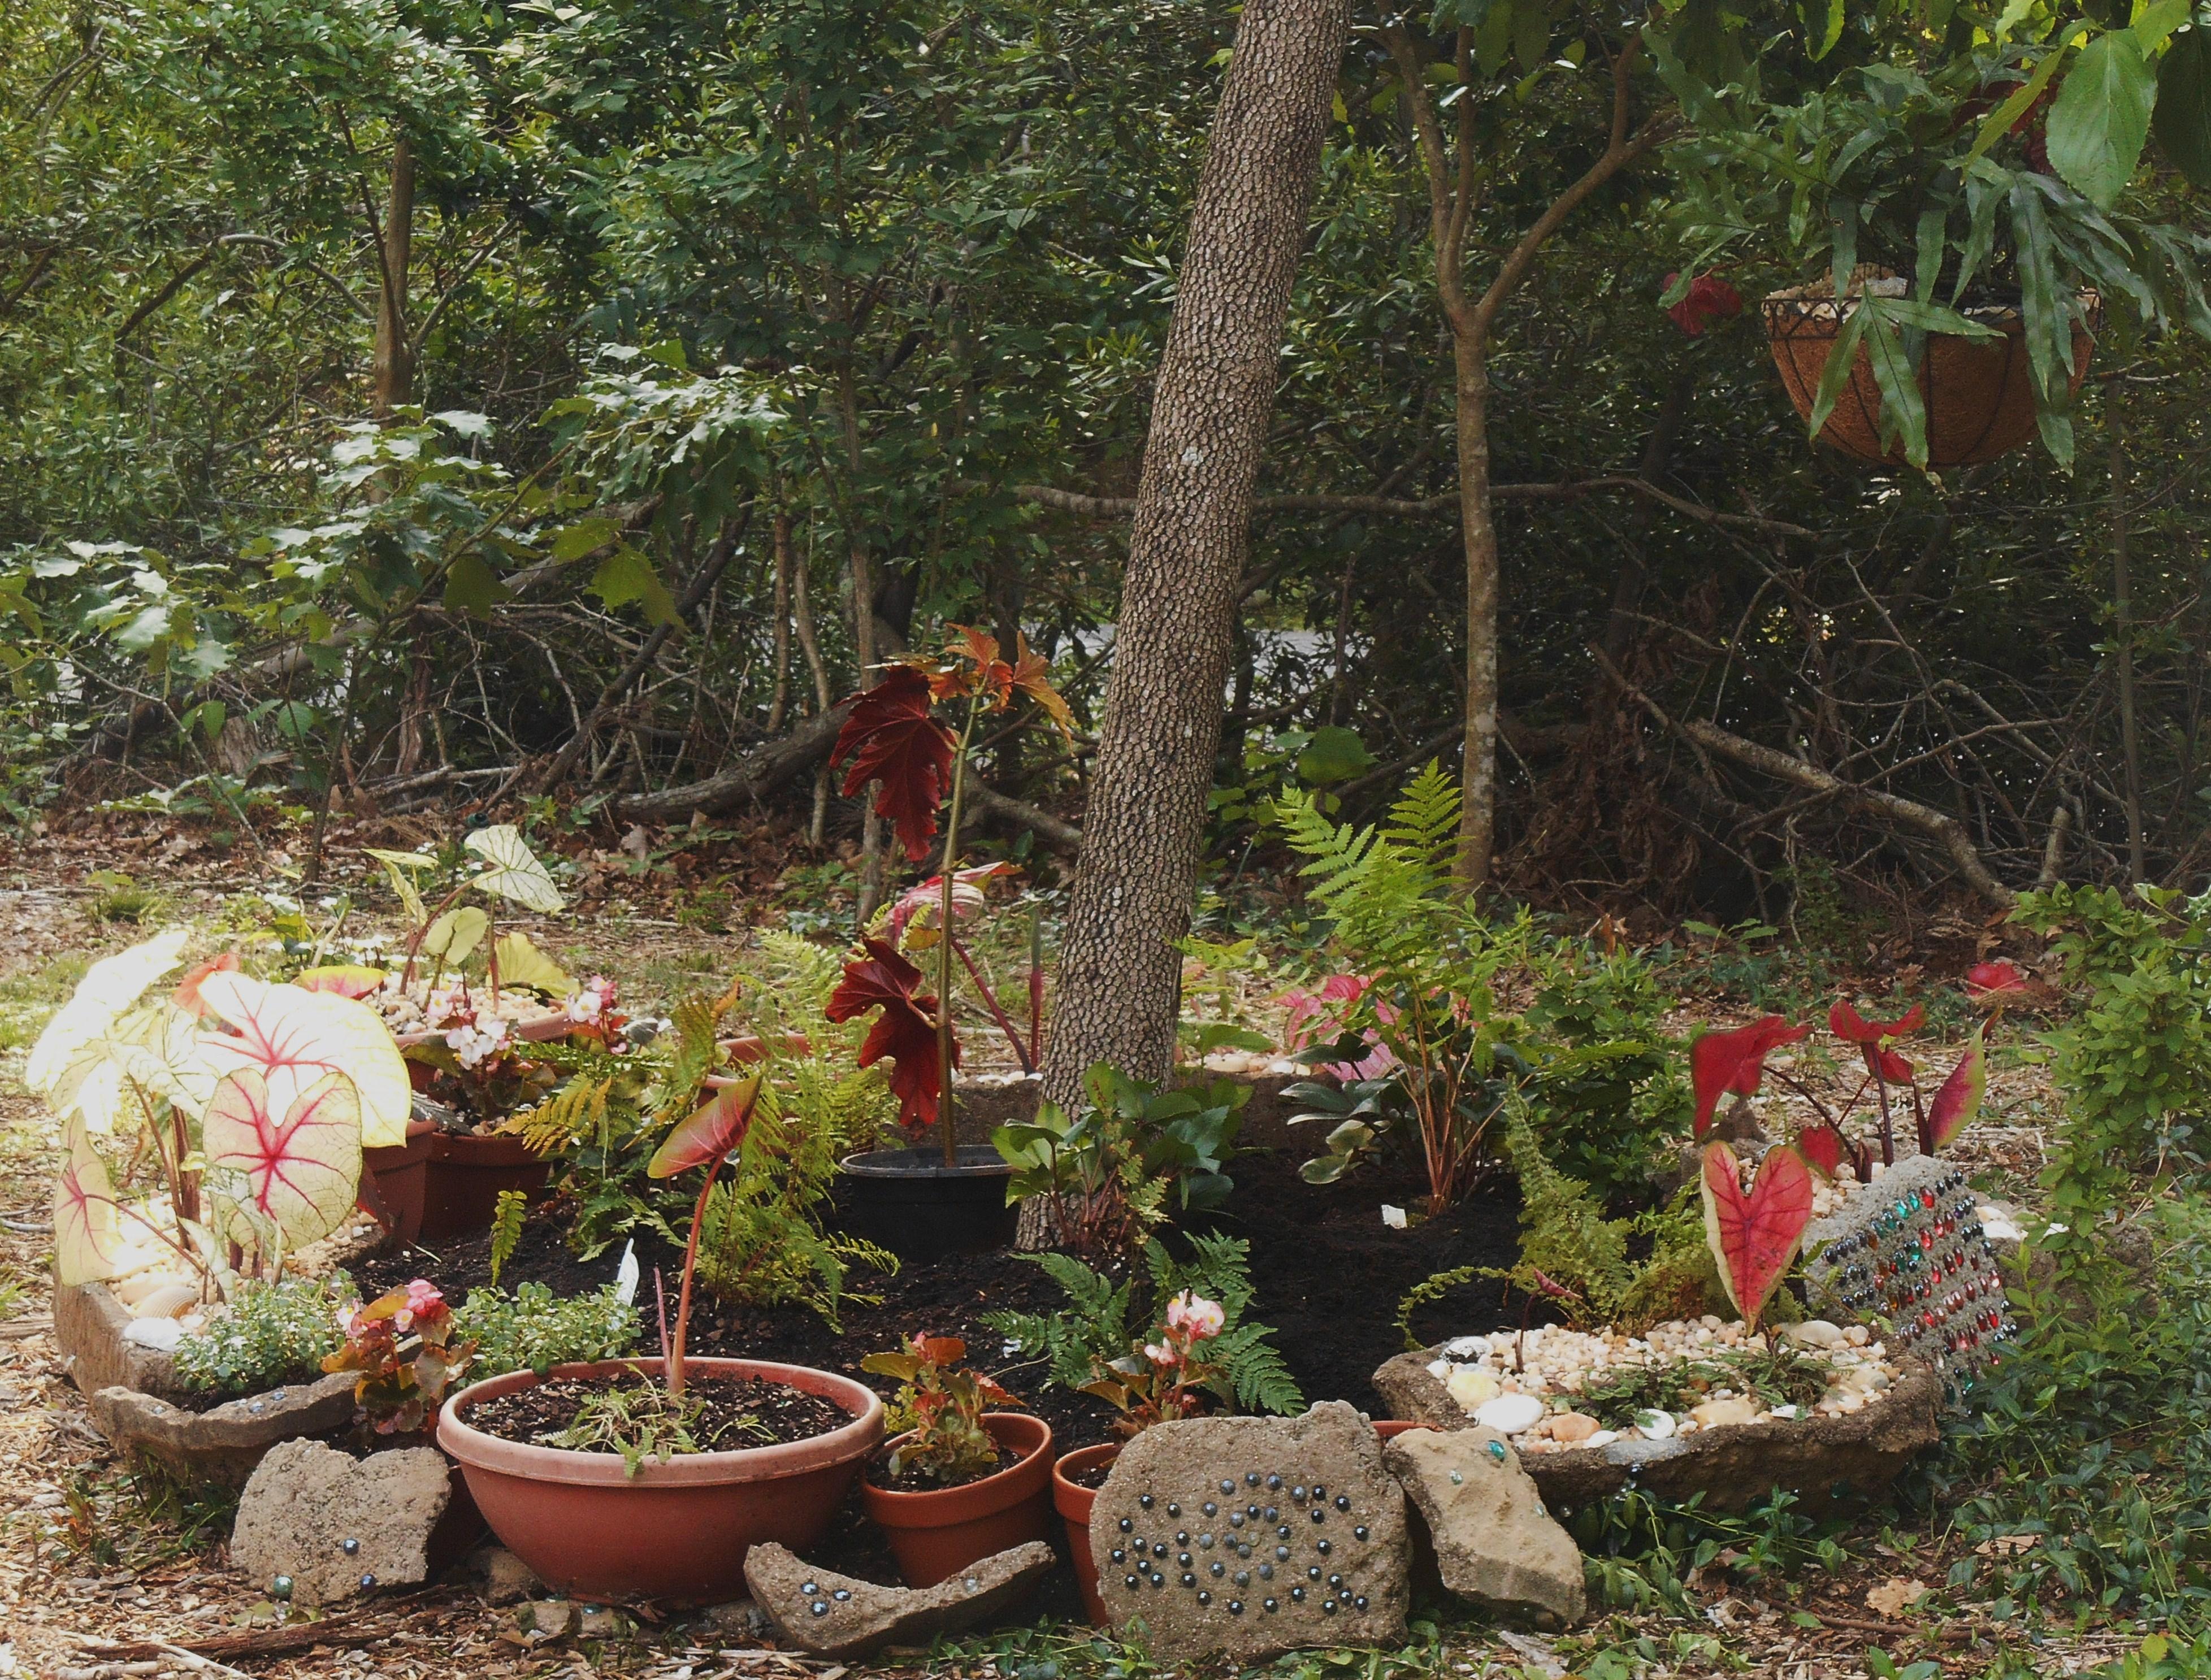 recycling in the garden | Forest Garden